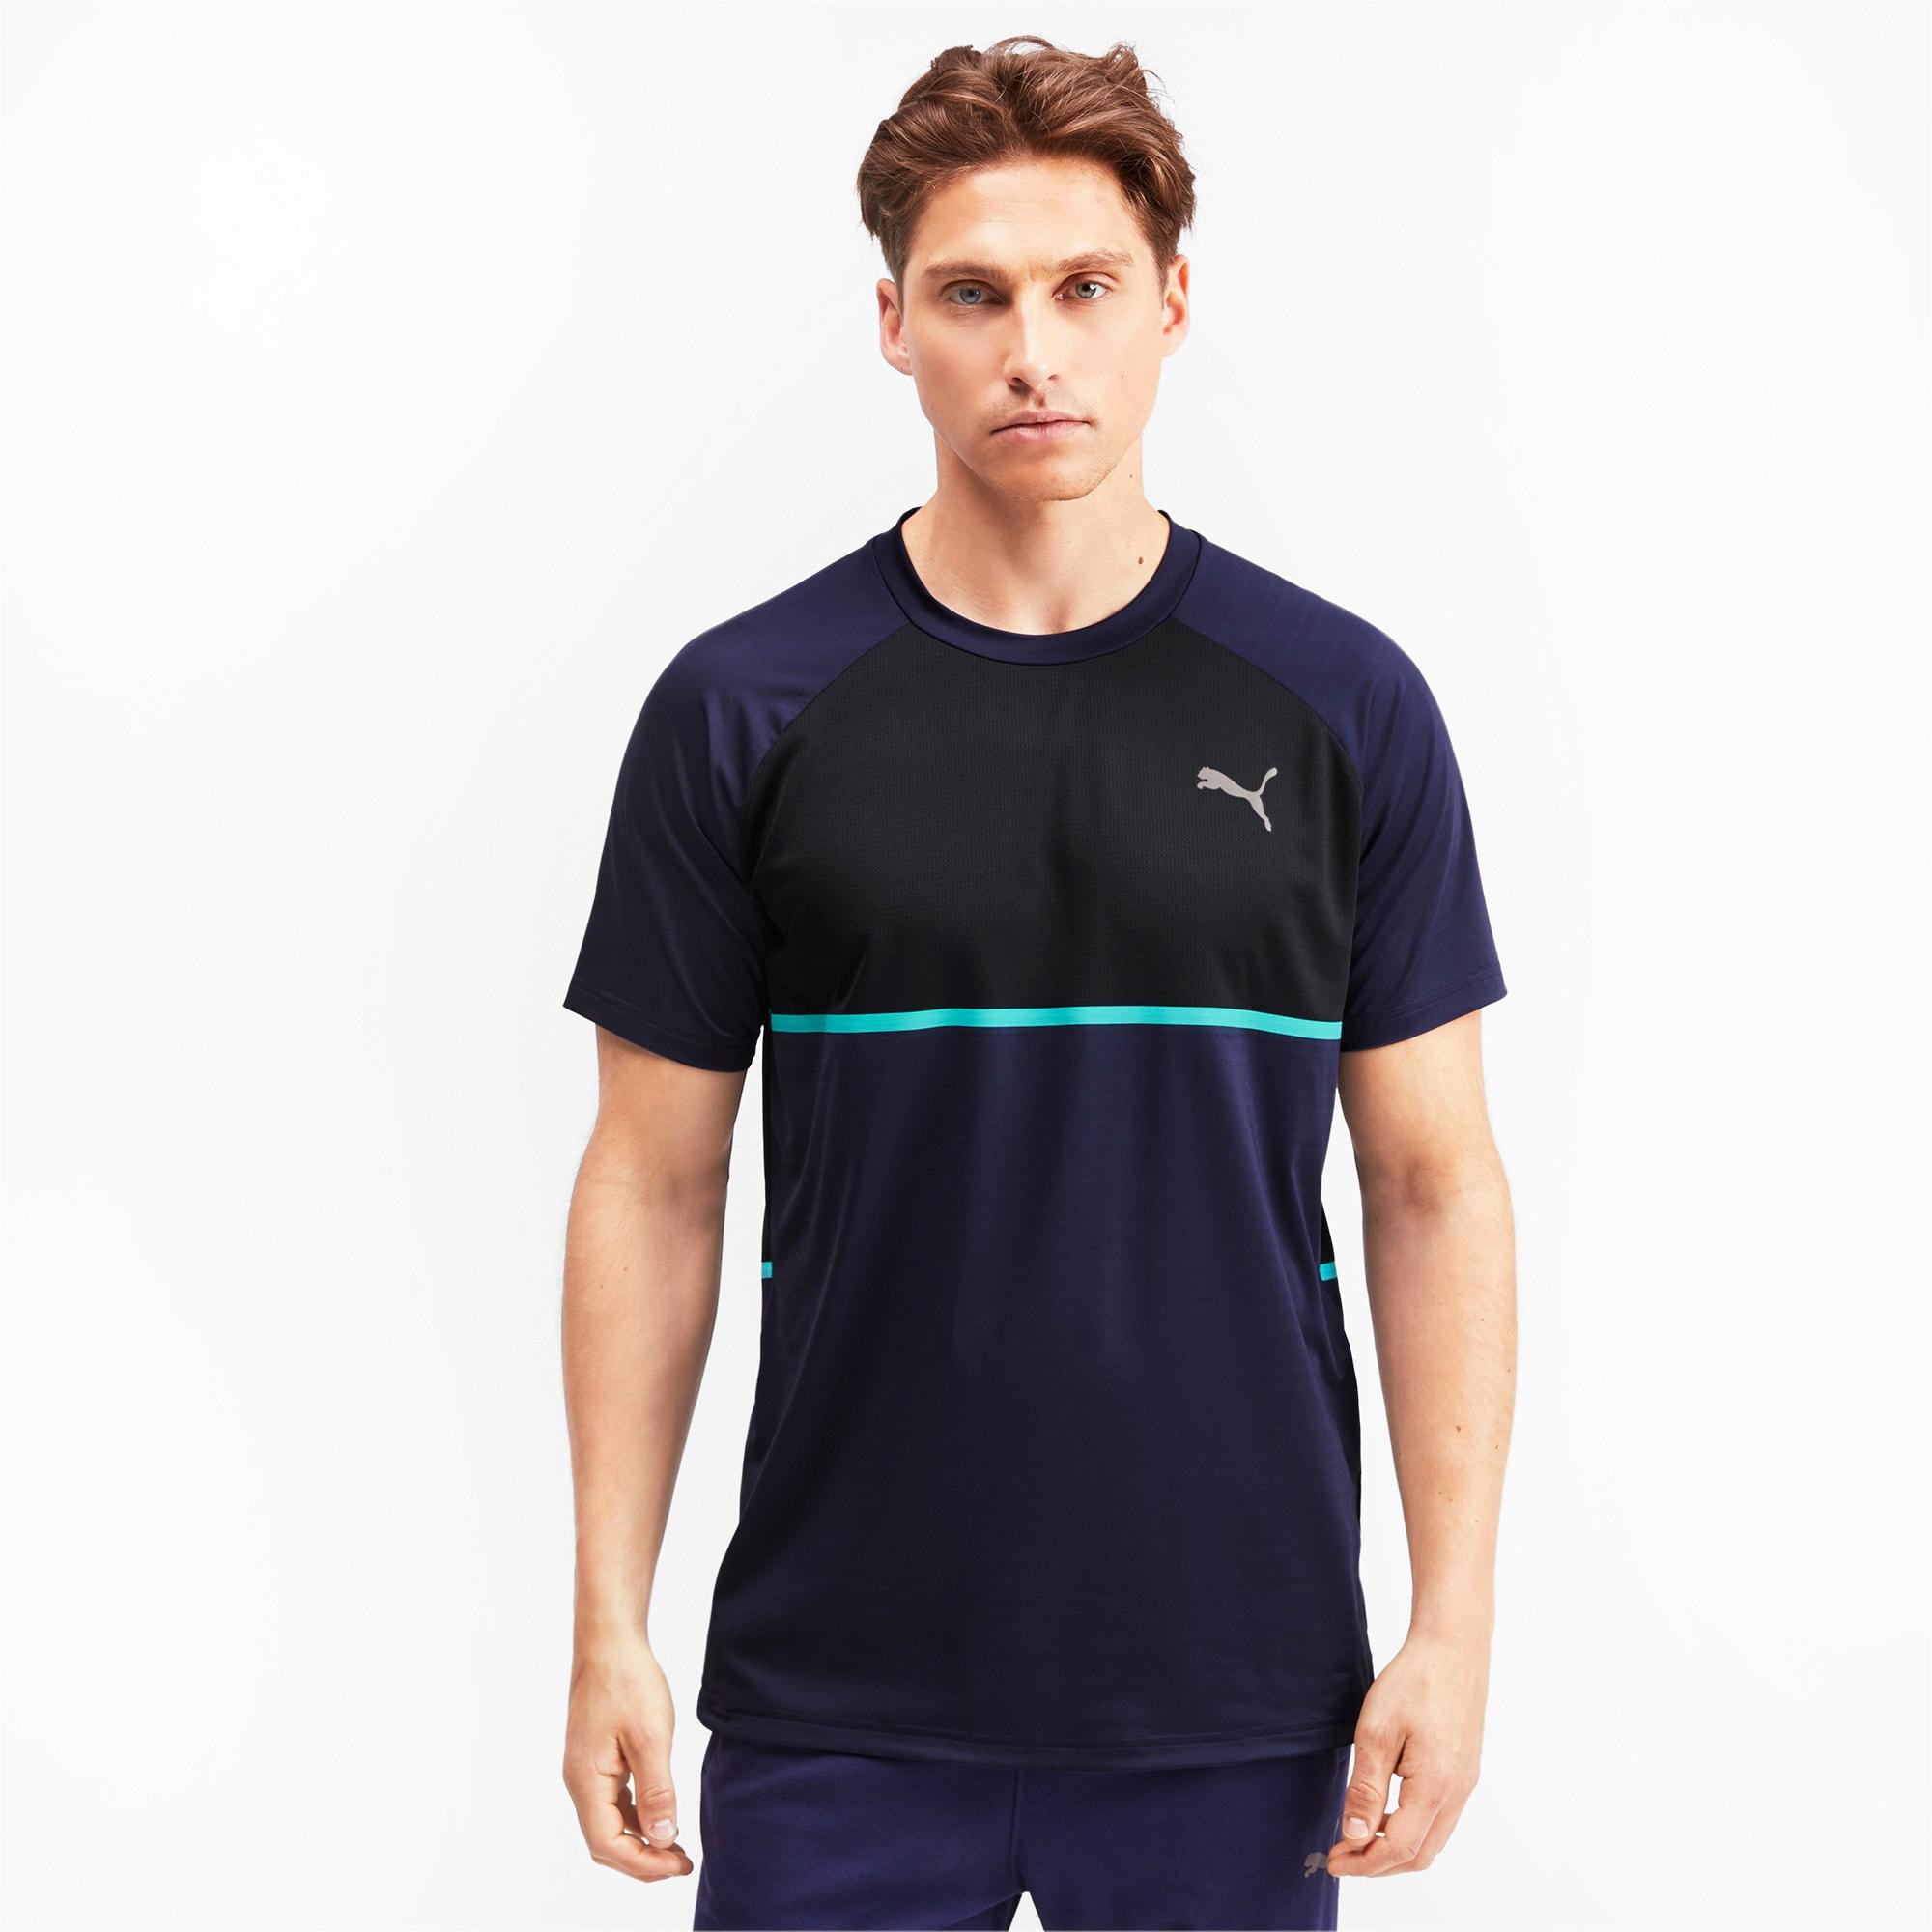 Thumbnail 1 of Power BND T-shirt voor heren, Peacoat-Puma Black, medium